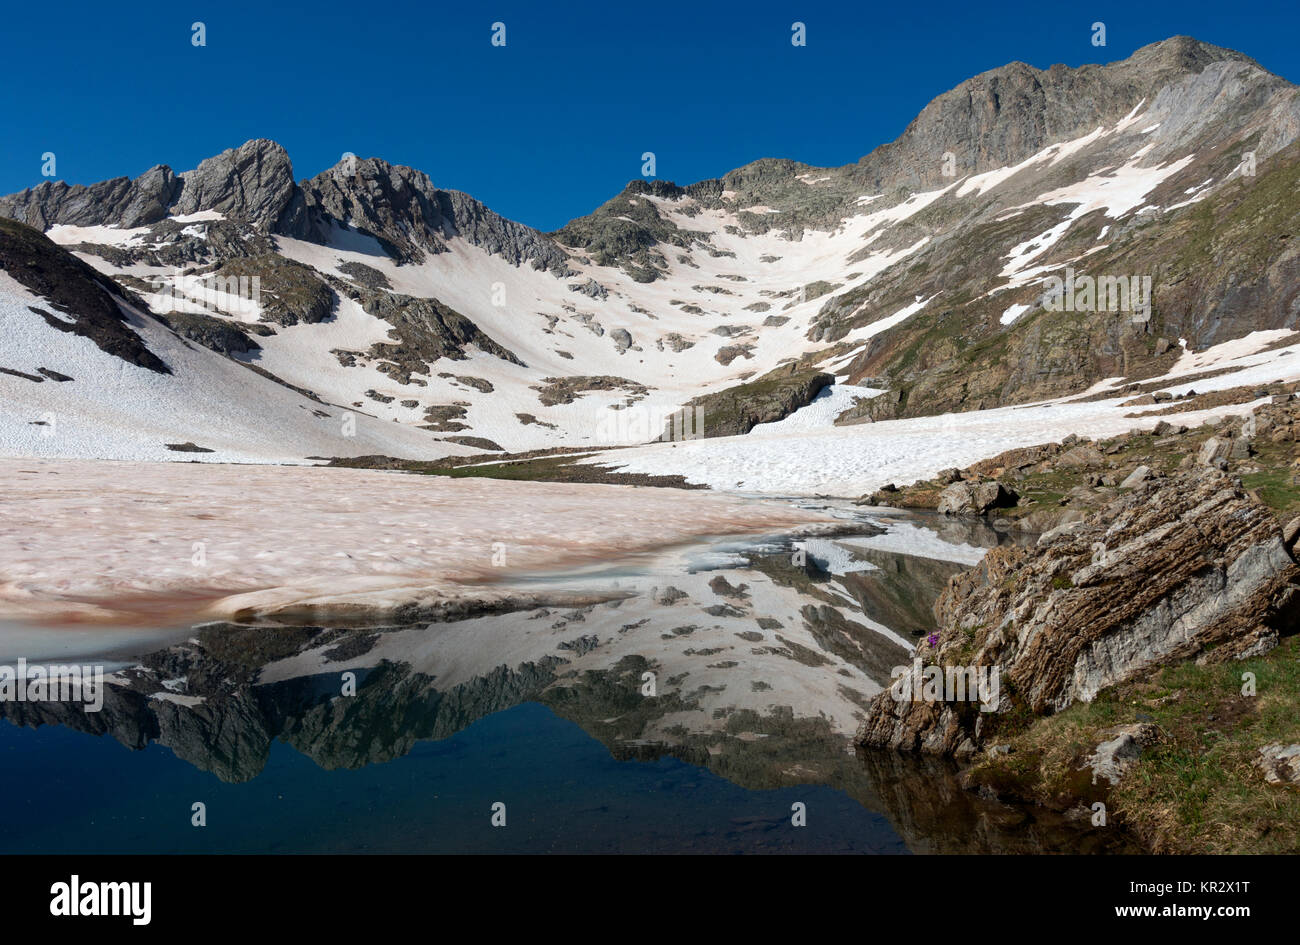 Posets-Maladeta Natural Park.Pyrenees.Huesca.Spain - Stock Image